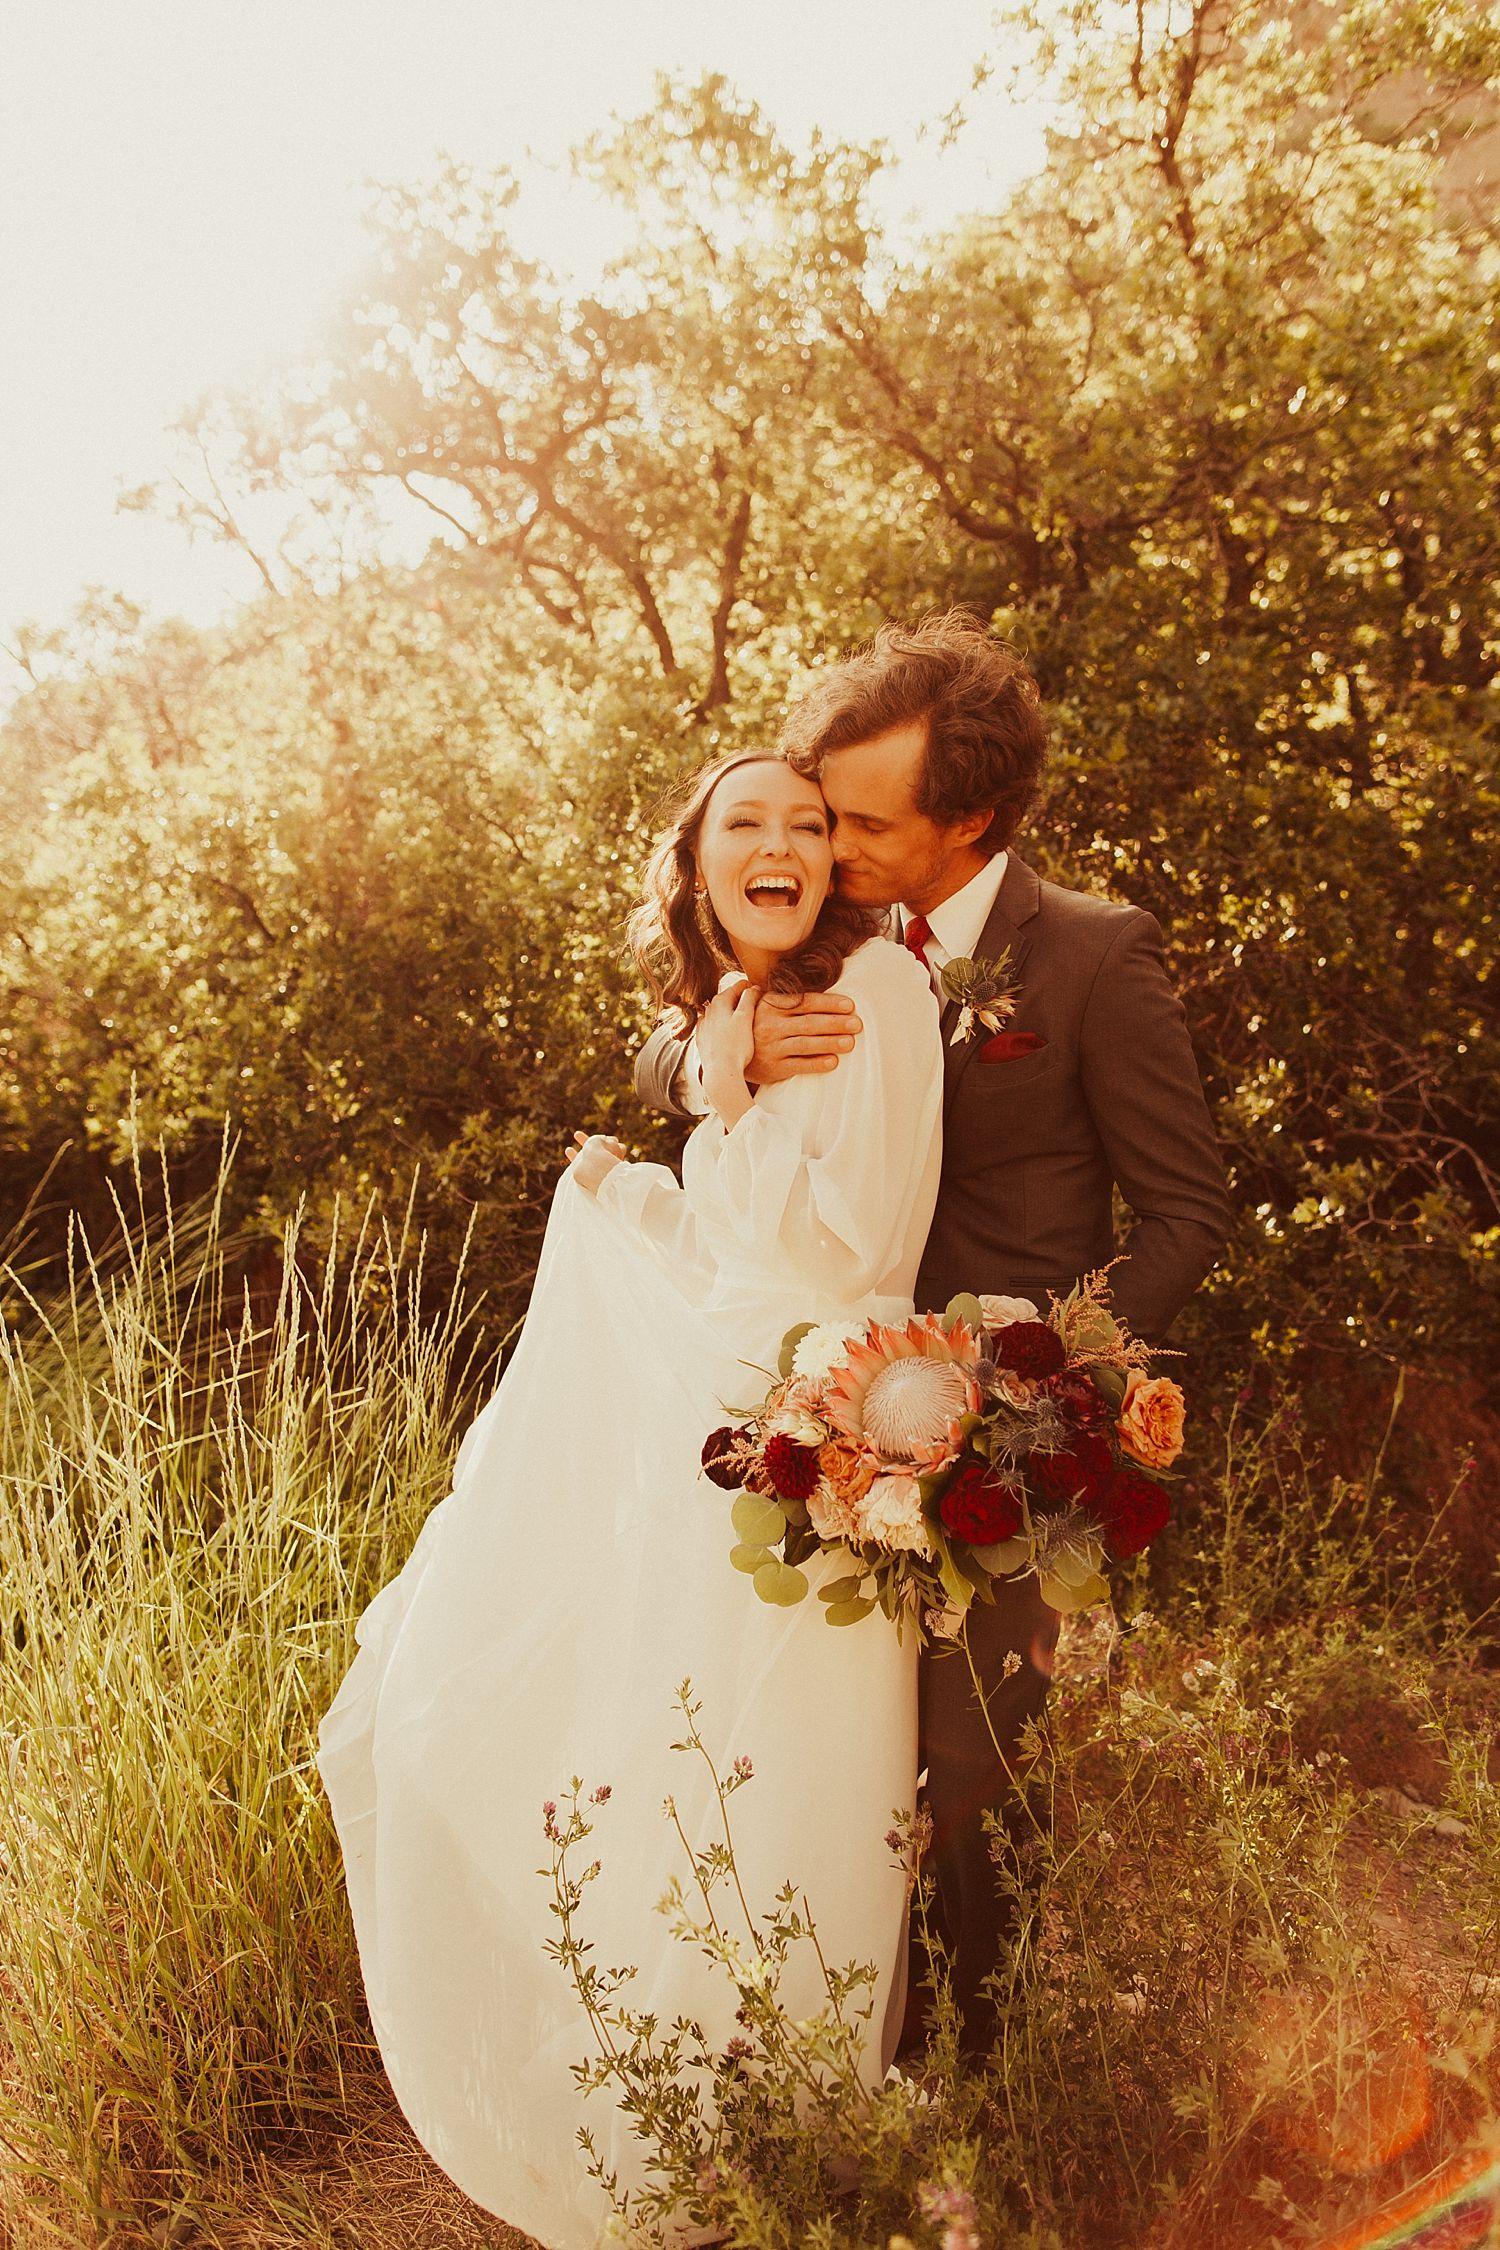 the-startup-building-wedding-provo-utah_3352.jpg